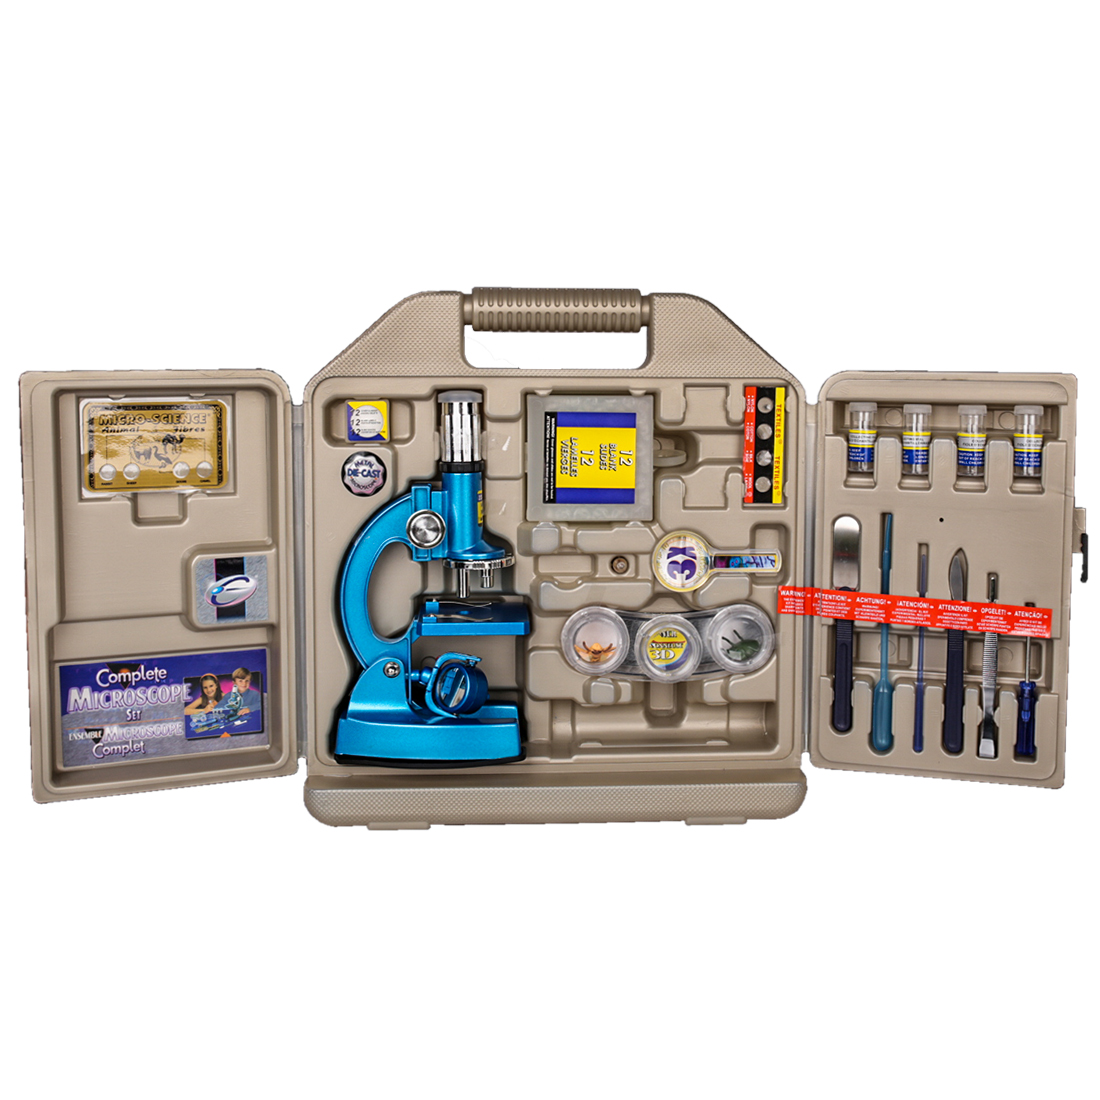 DIY 100X 200X 300X 600X 1200X Hd gran angular microscopio óptico puzle análisis celular equipo Experimental Stem Toy para niños